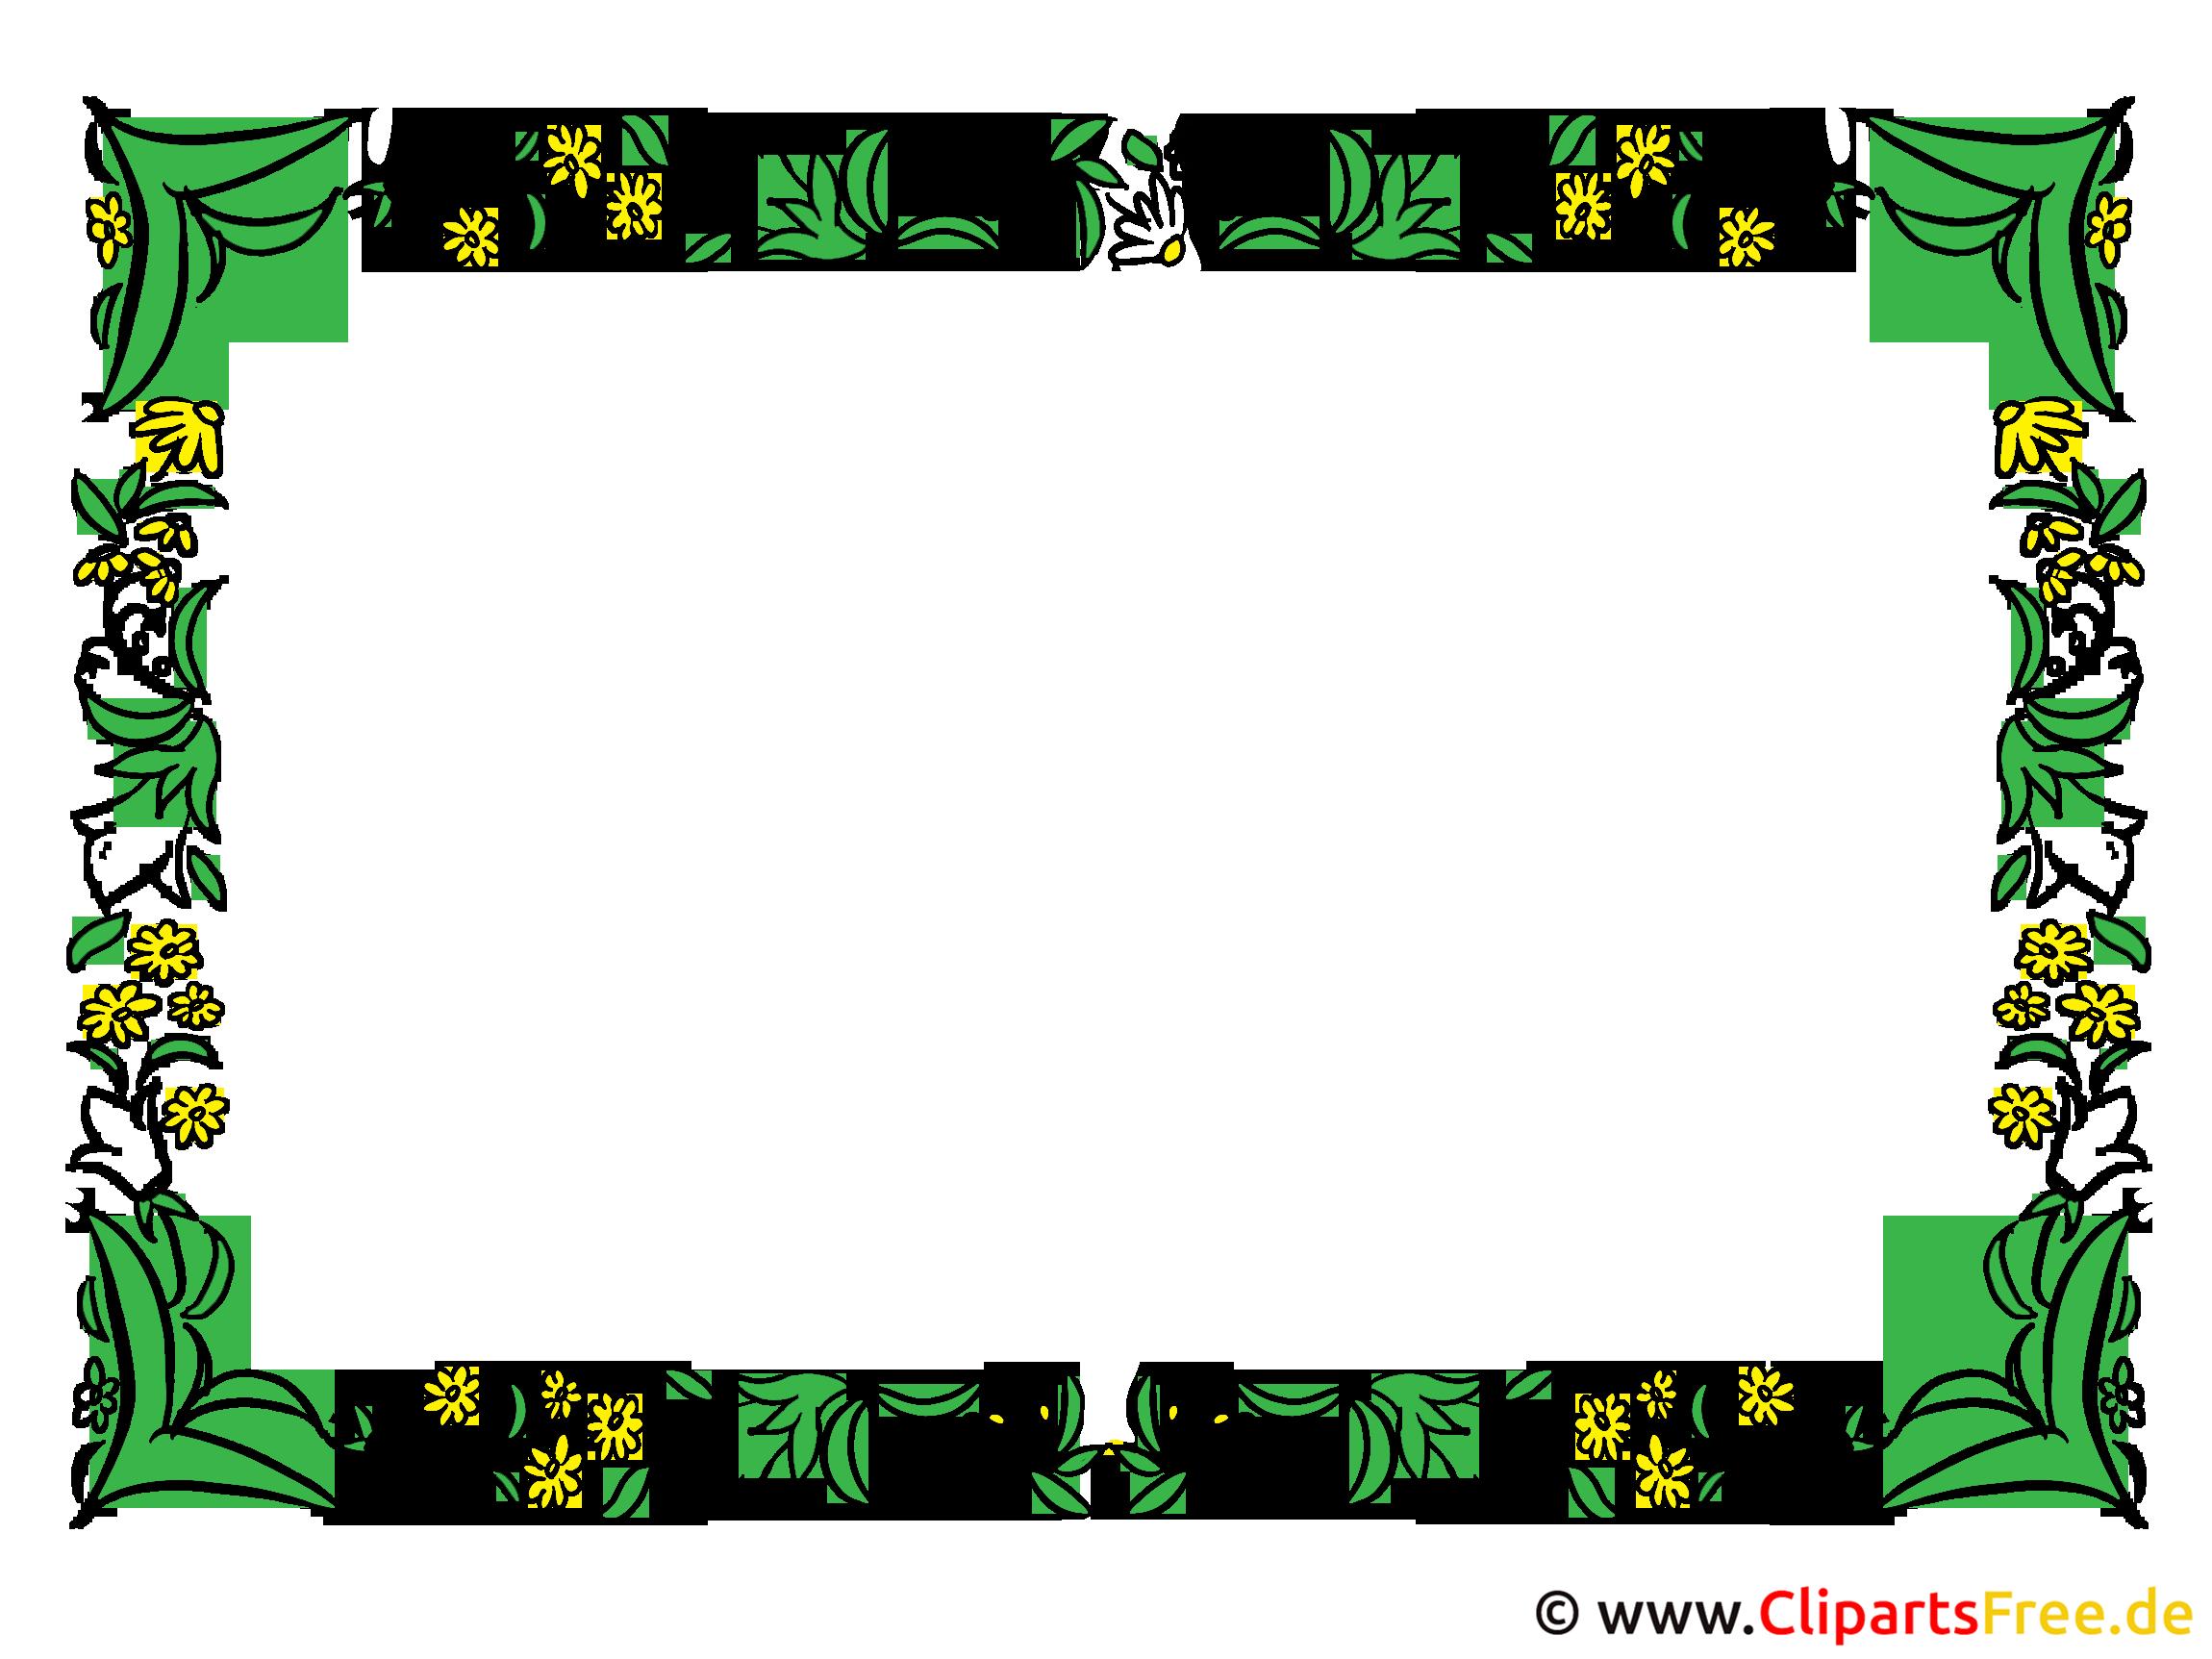 Floralen Rahmen